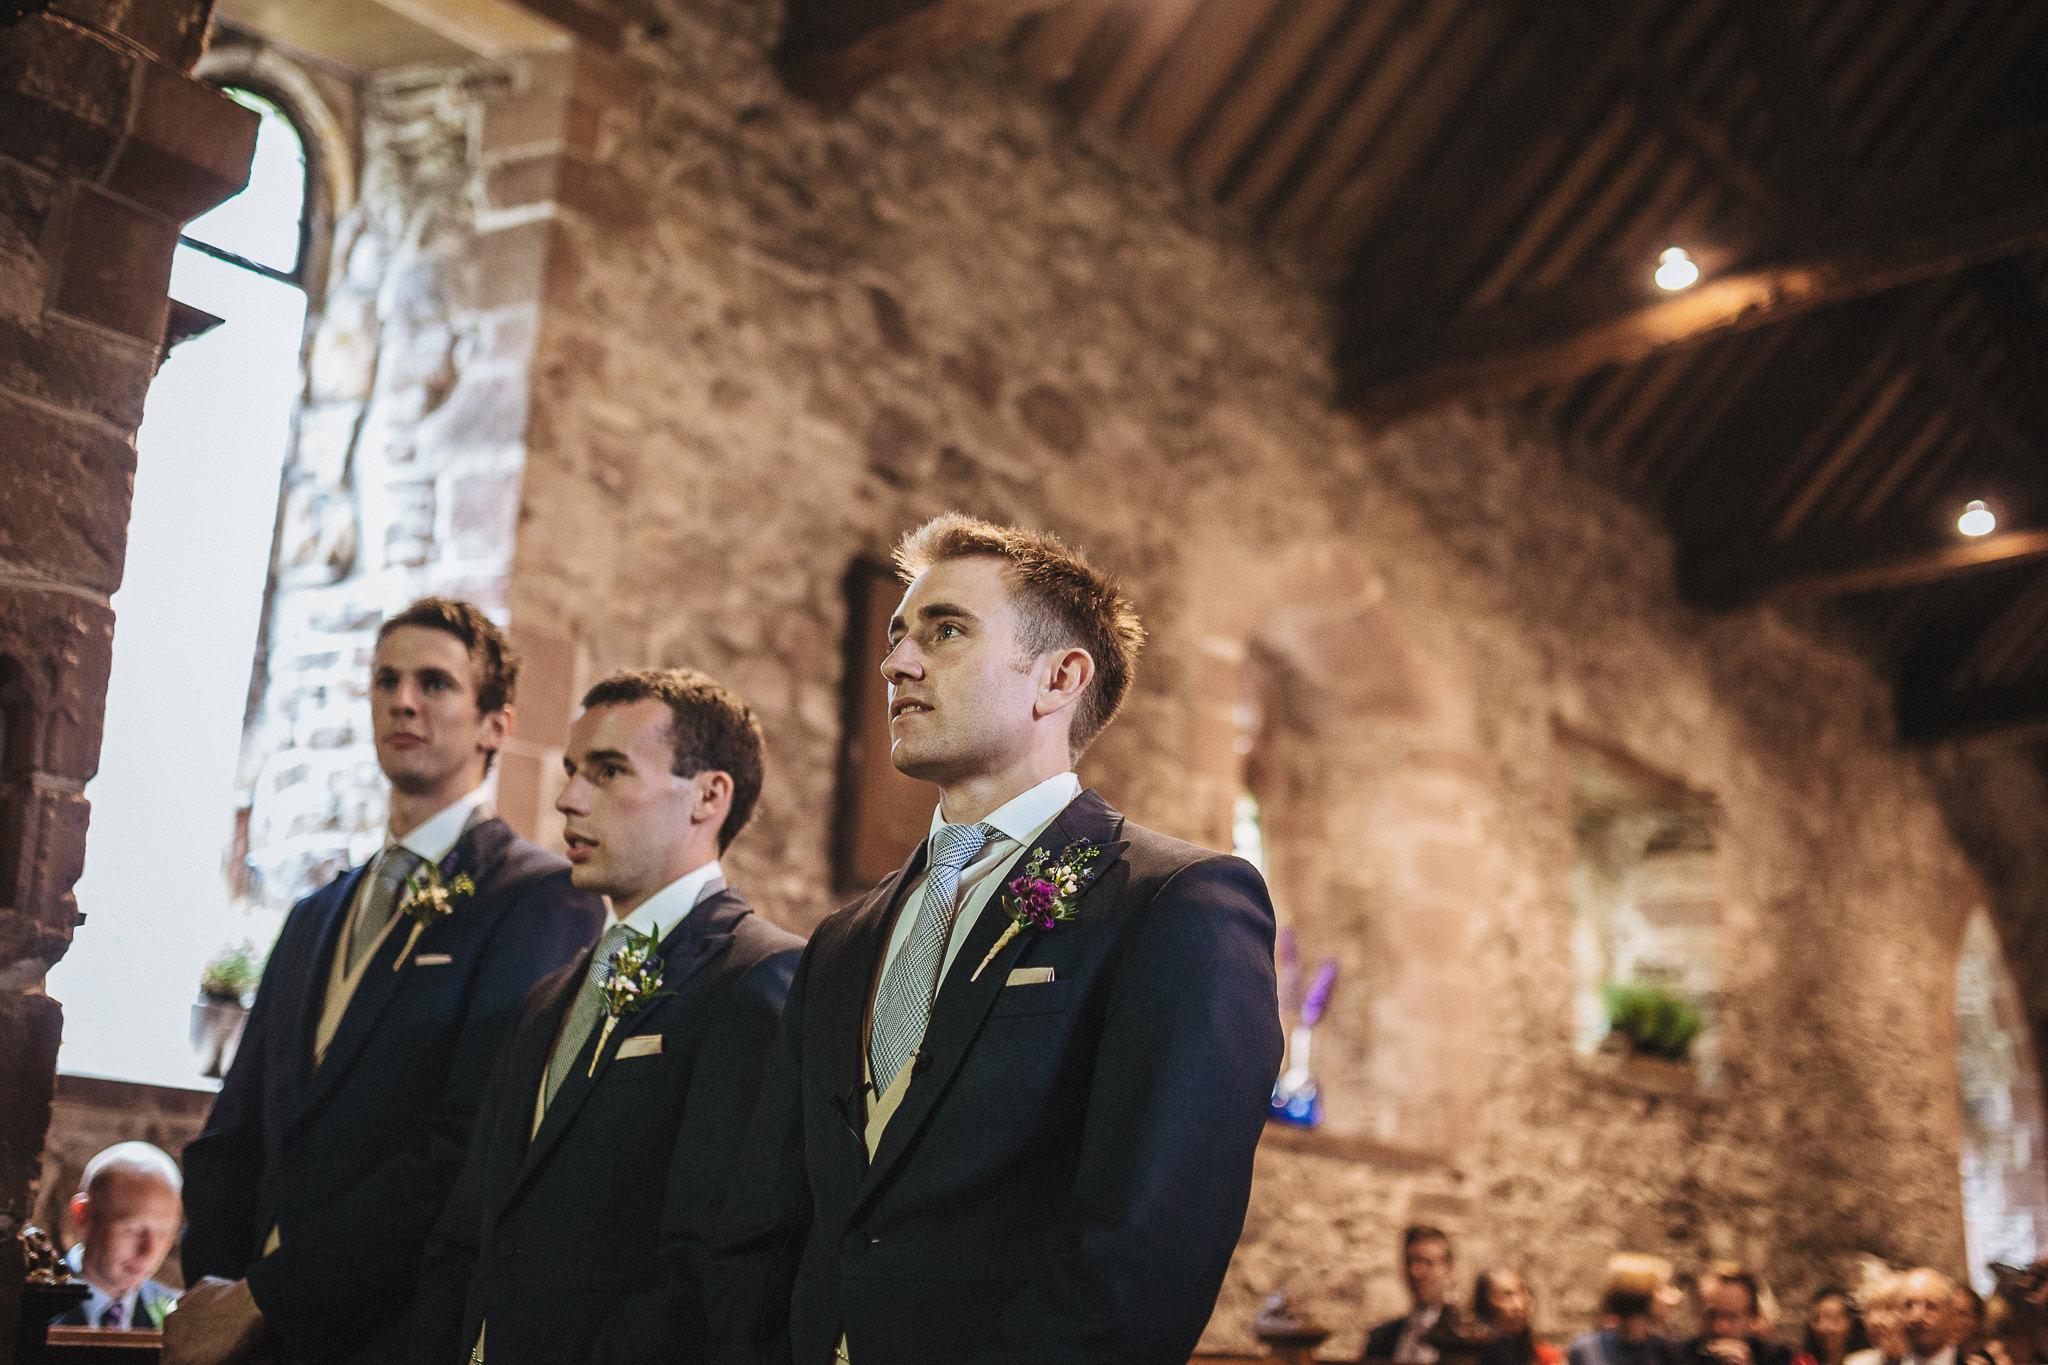 paul-marbrook-Farm-Wedding-Photographer-Lancashire-90025